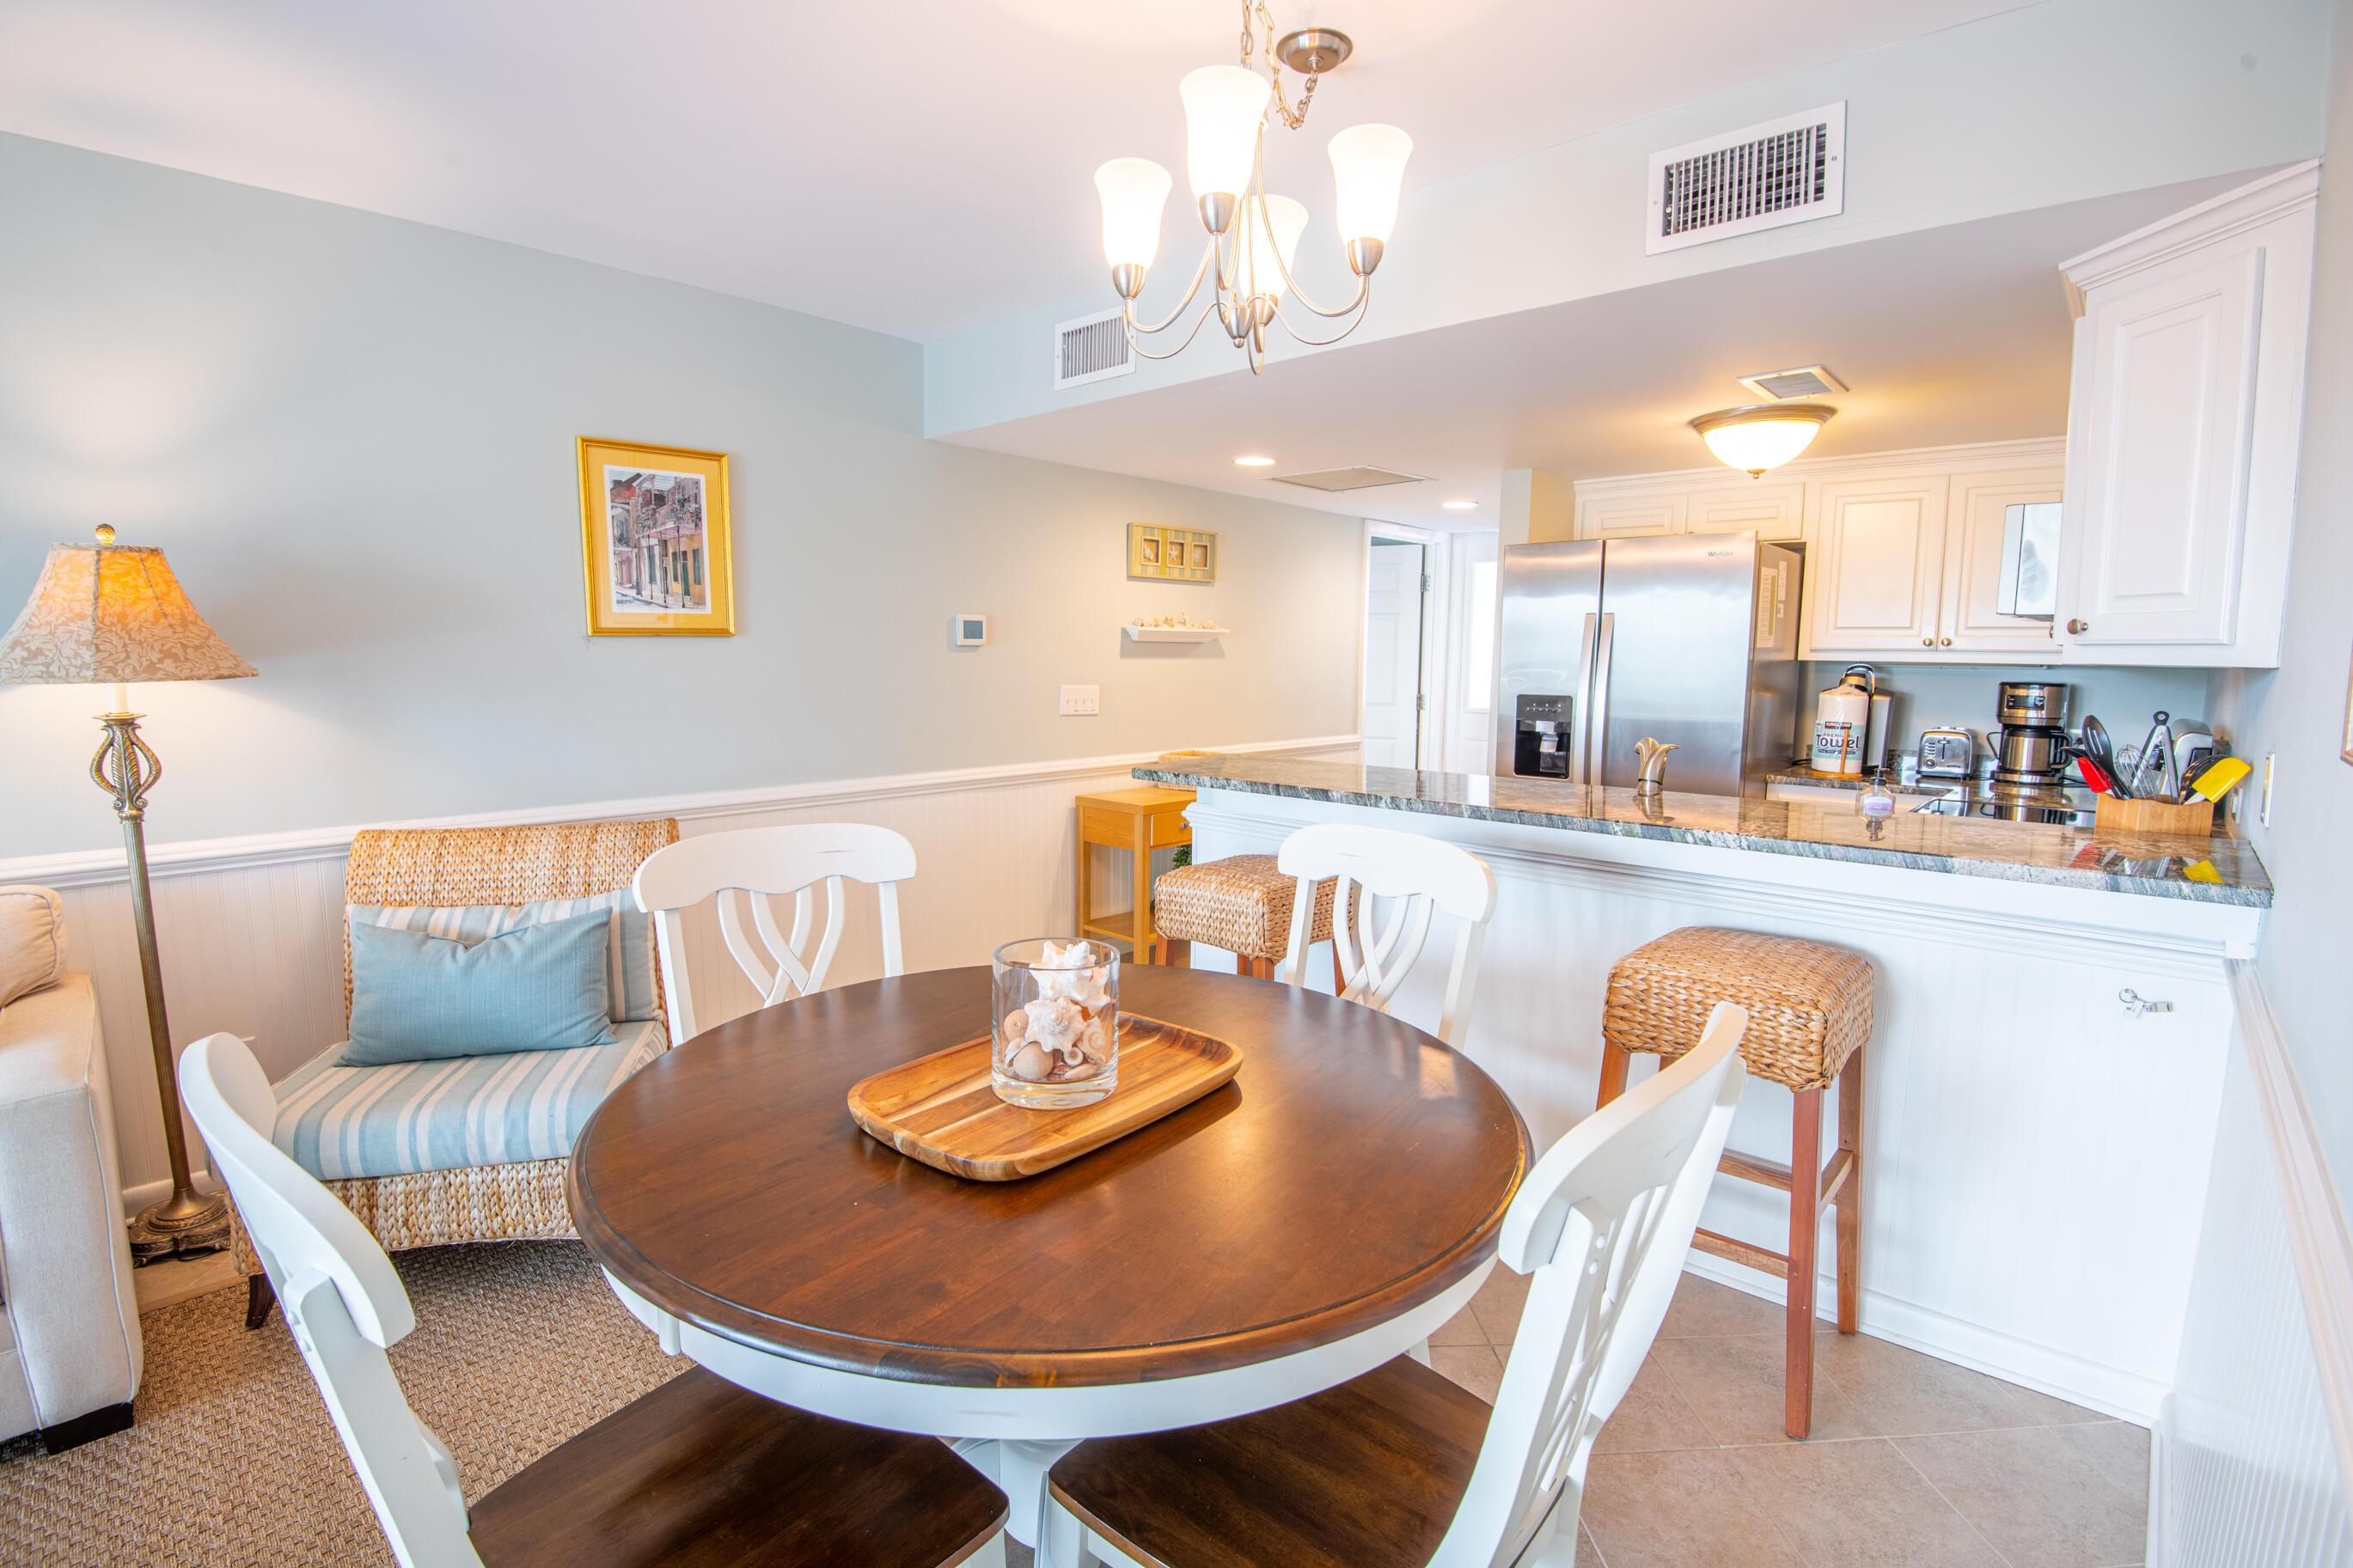 Atrium Villas Homes For Sale - 2935 Atrium Villa, Seabrook Island, SC - 37